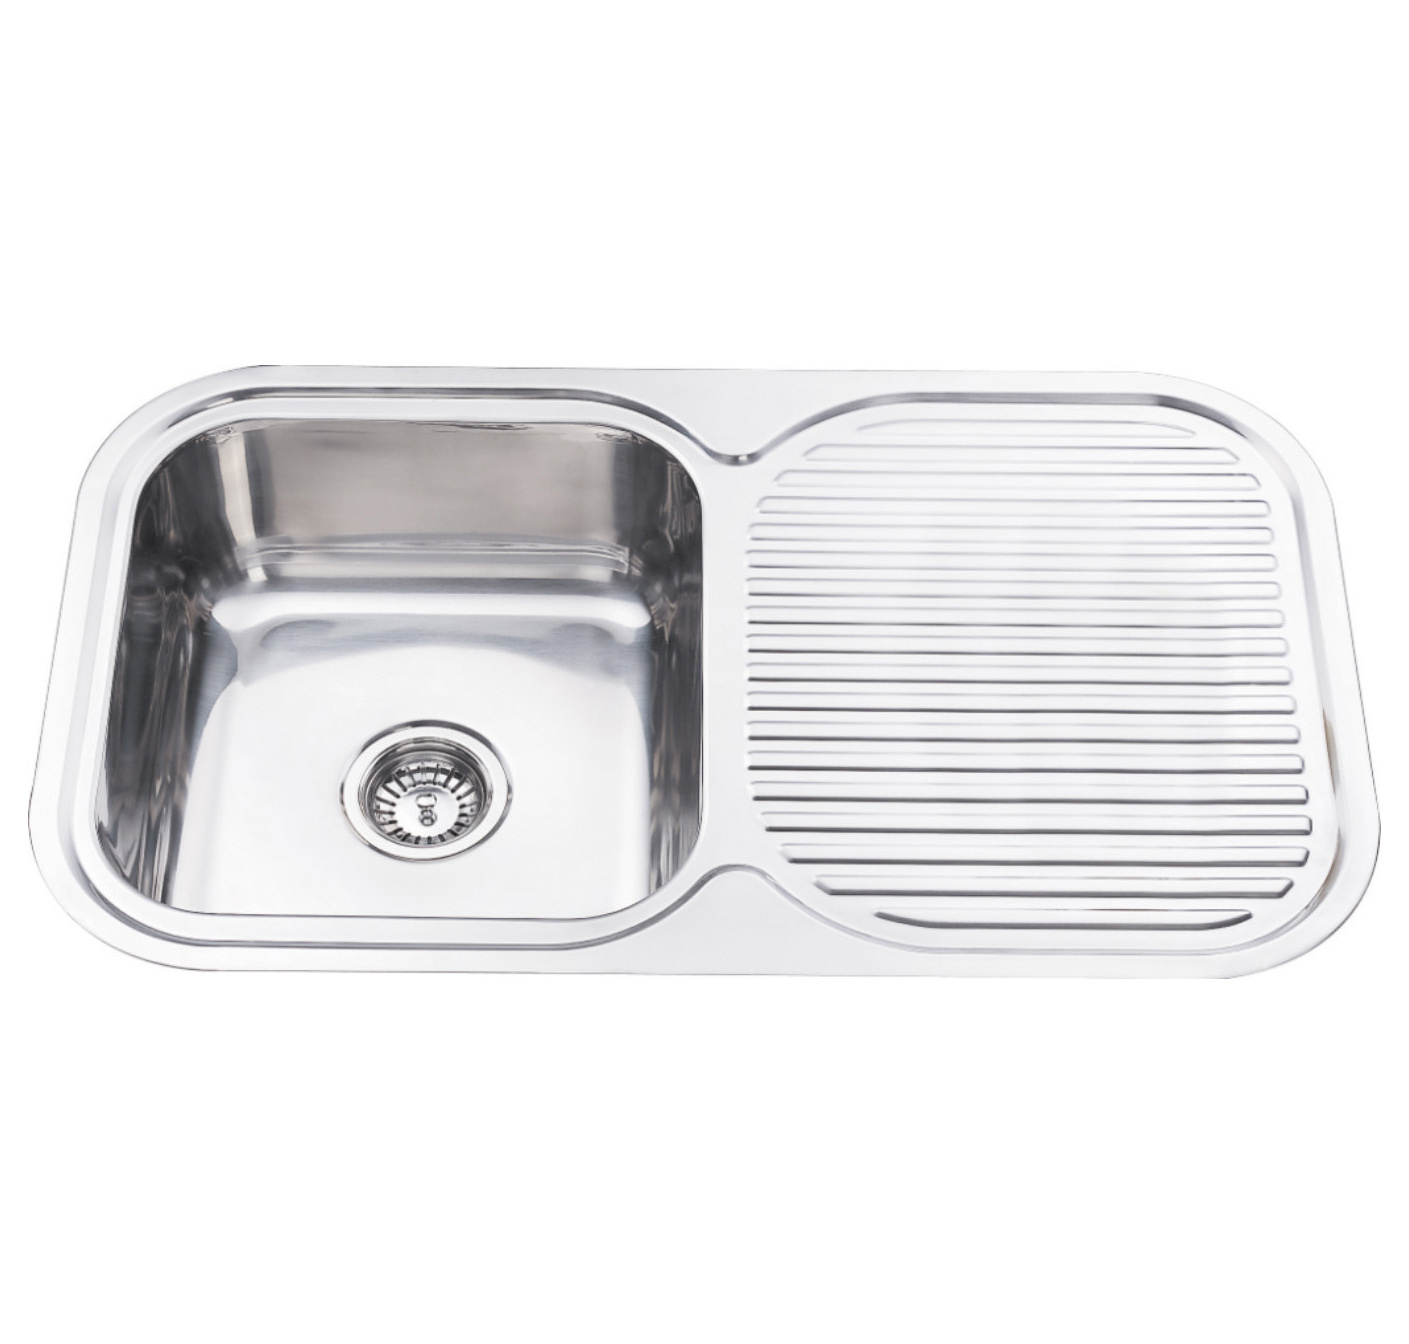 Walrus NH346S 不鏽鋼單膽單翼平邊檯面廚盆連去水 850x500x180mm 鏡面鉻